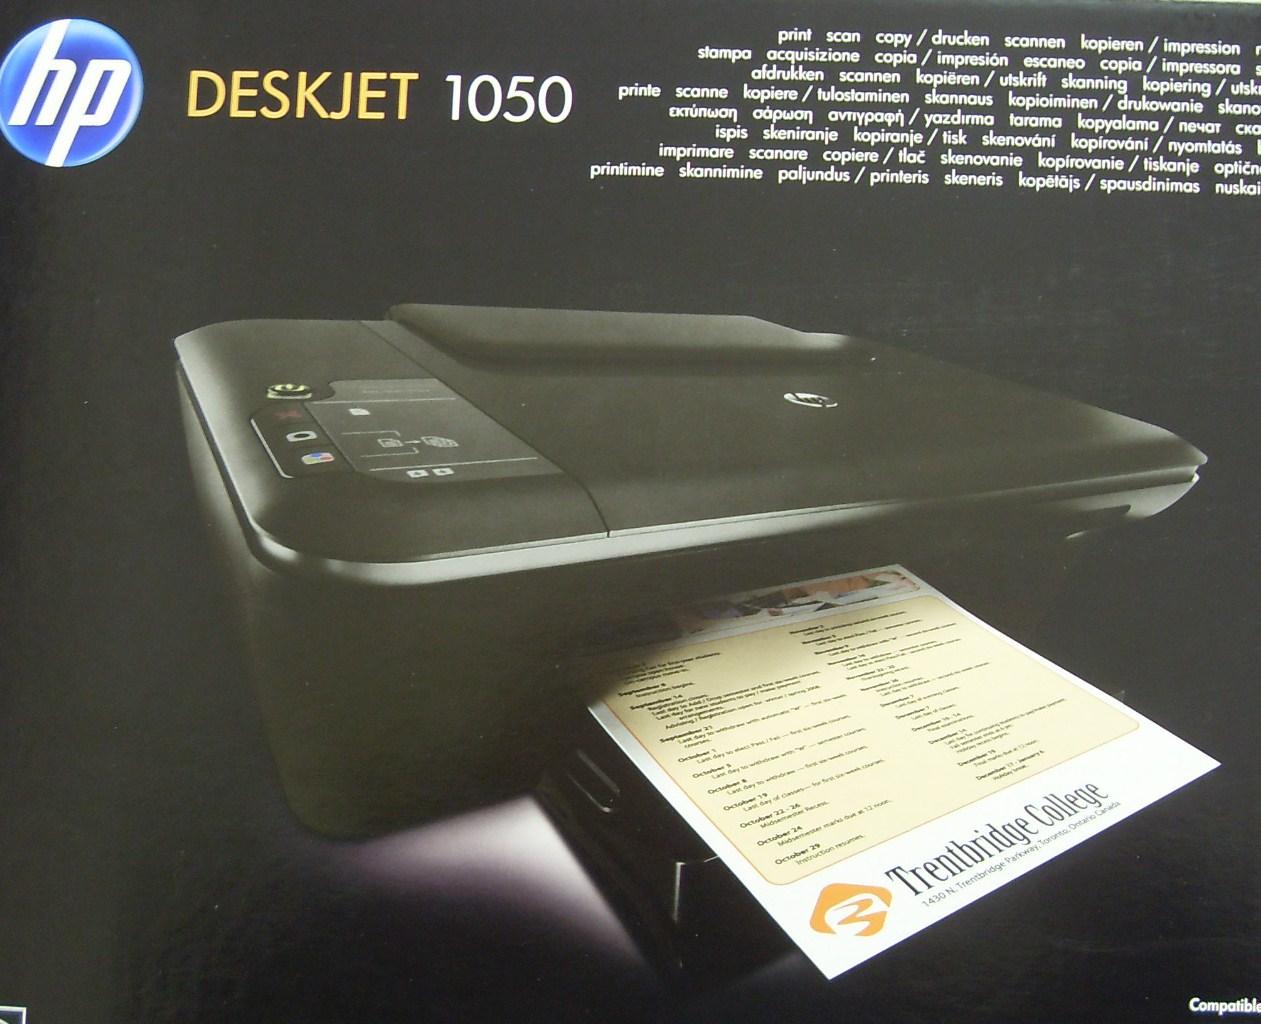 Strange Install Printer Free Install Printer Hp Deskjet 1050 Download Free Architecture Designs Viewormadebymaigaardcom